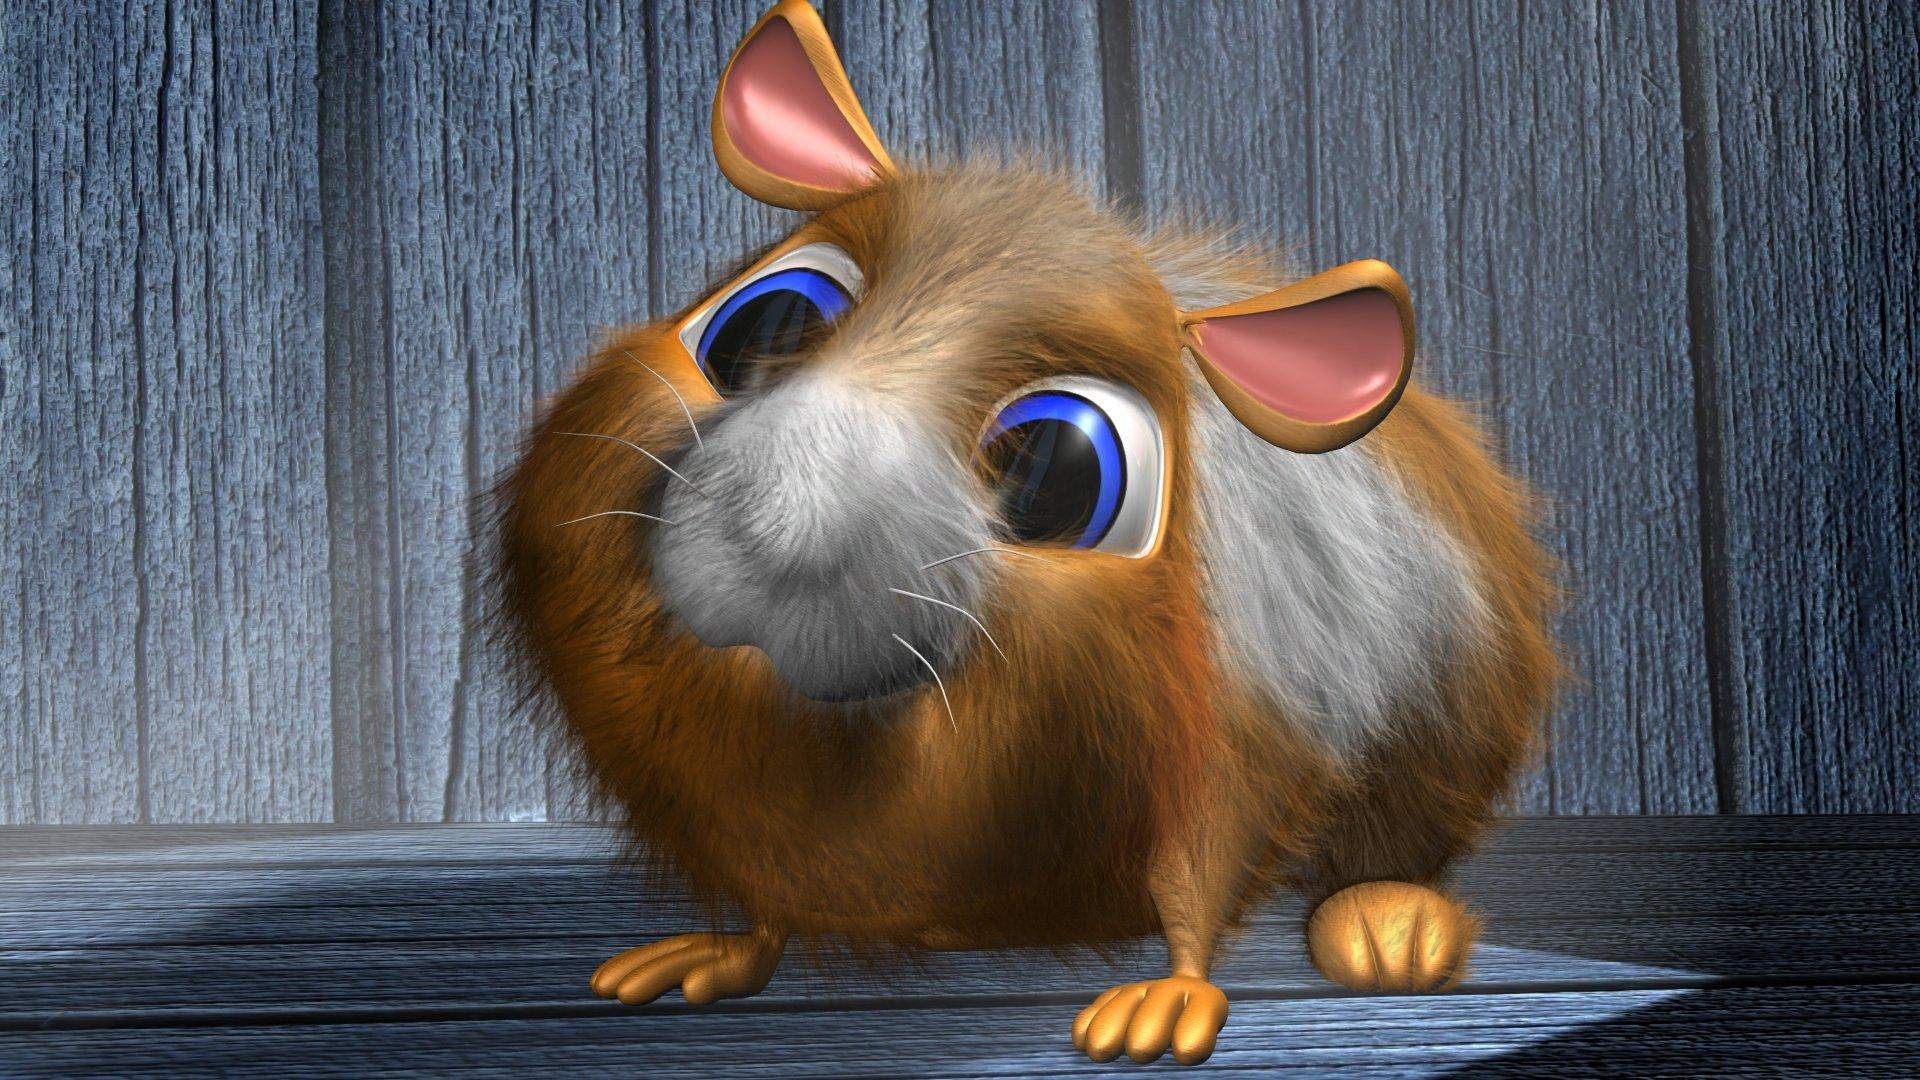 Papel De Parede Cartoon: Cartoon Hamster 3D Full HD Papel De Parede And Planos De